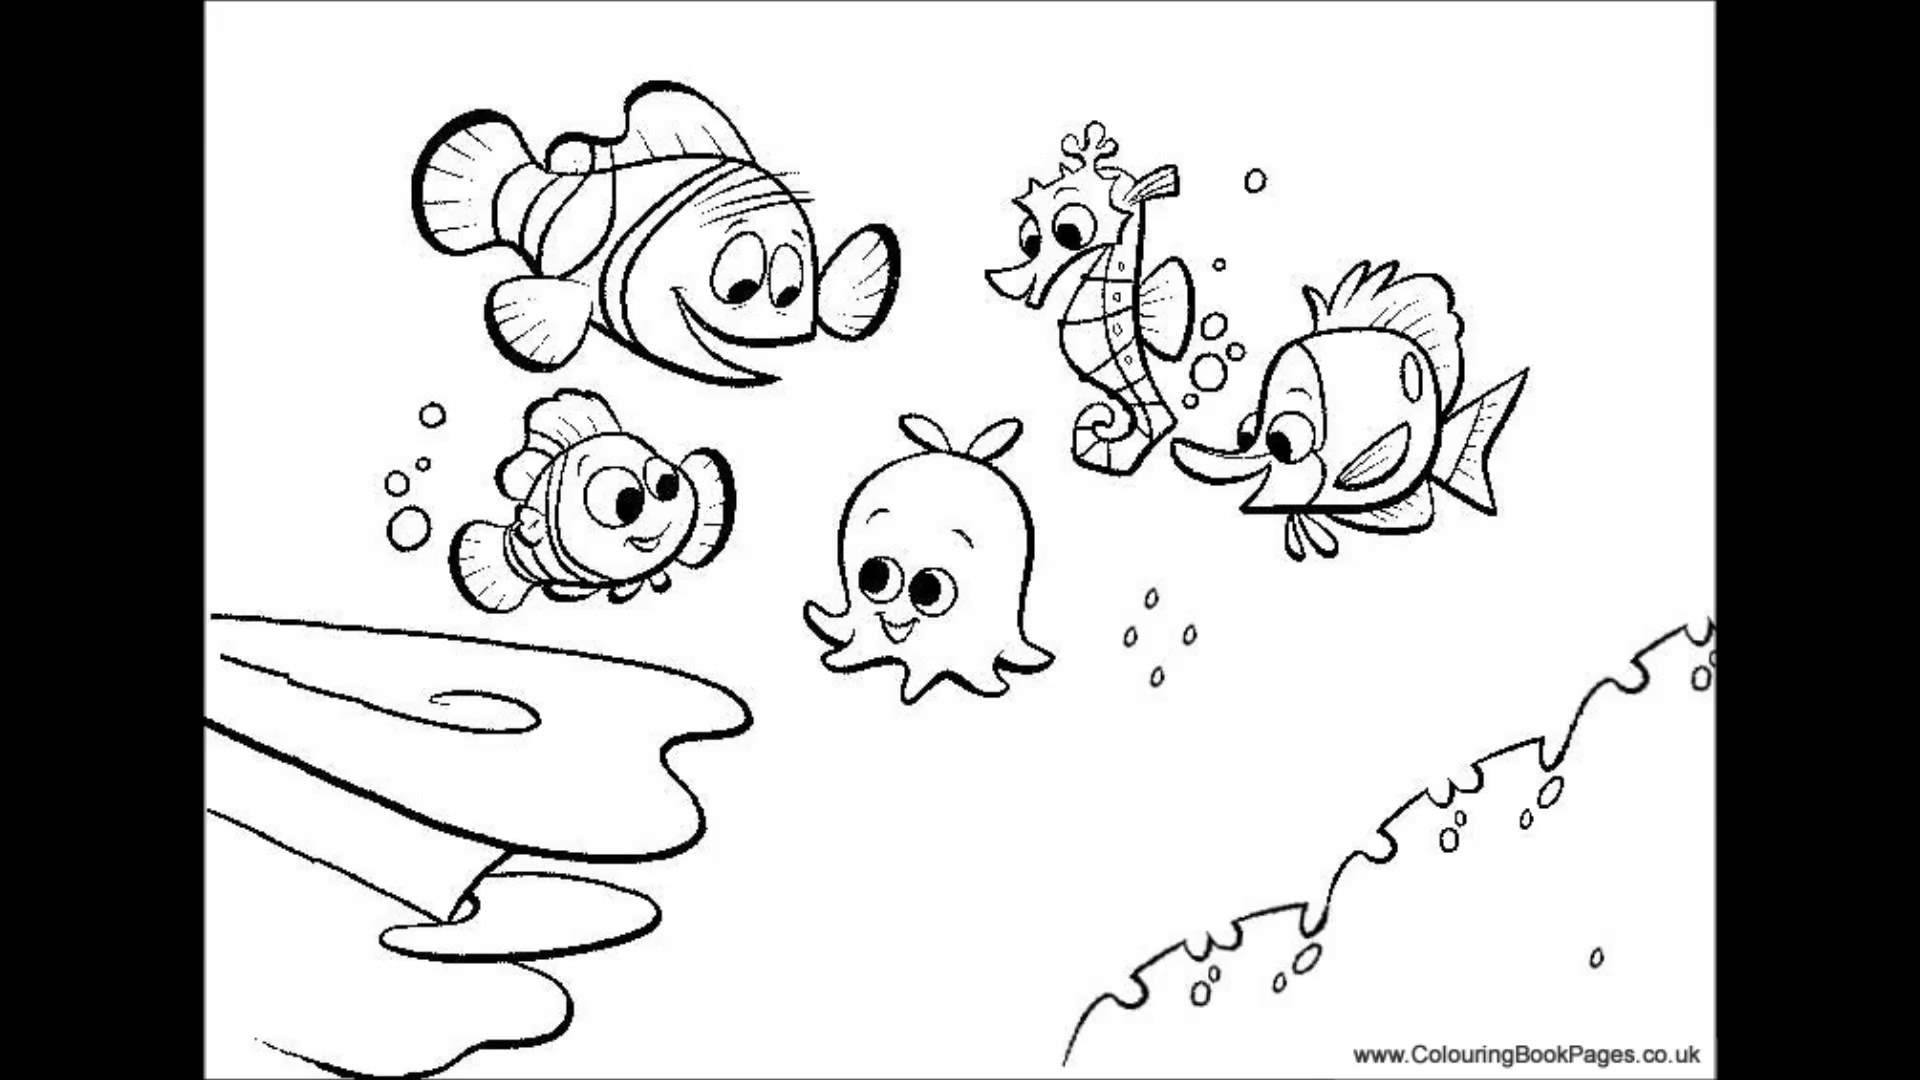 Aquarium Coloring Pages For Kids at GetDrawings | Free download